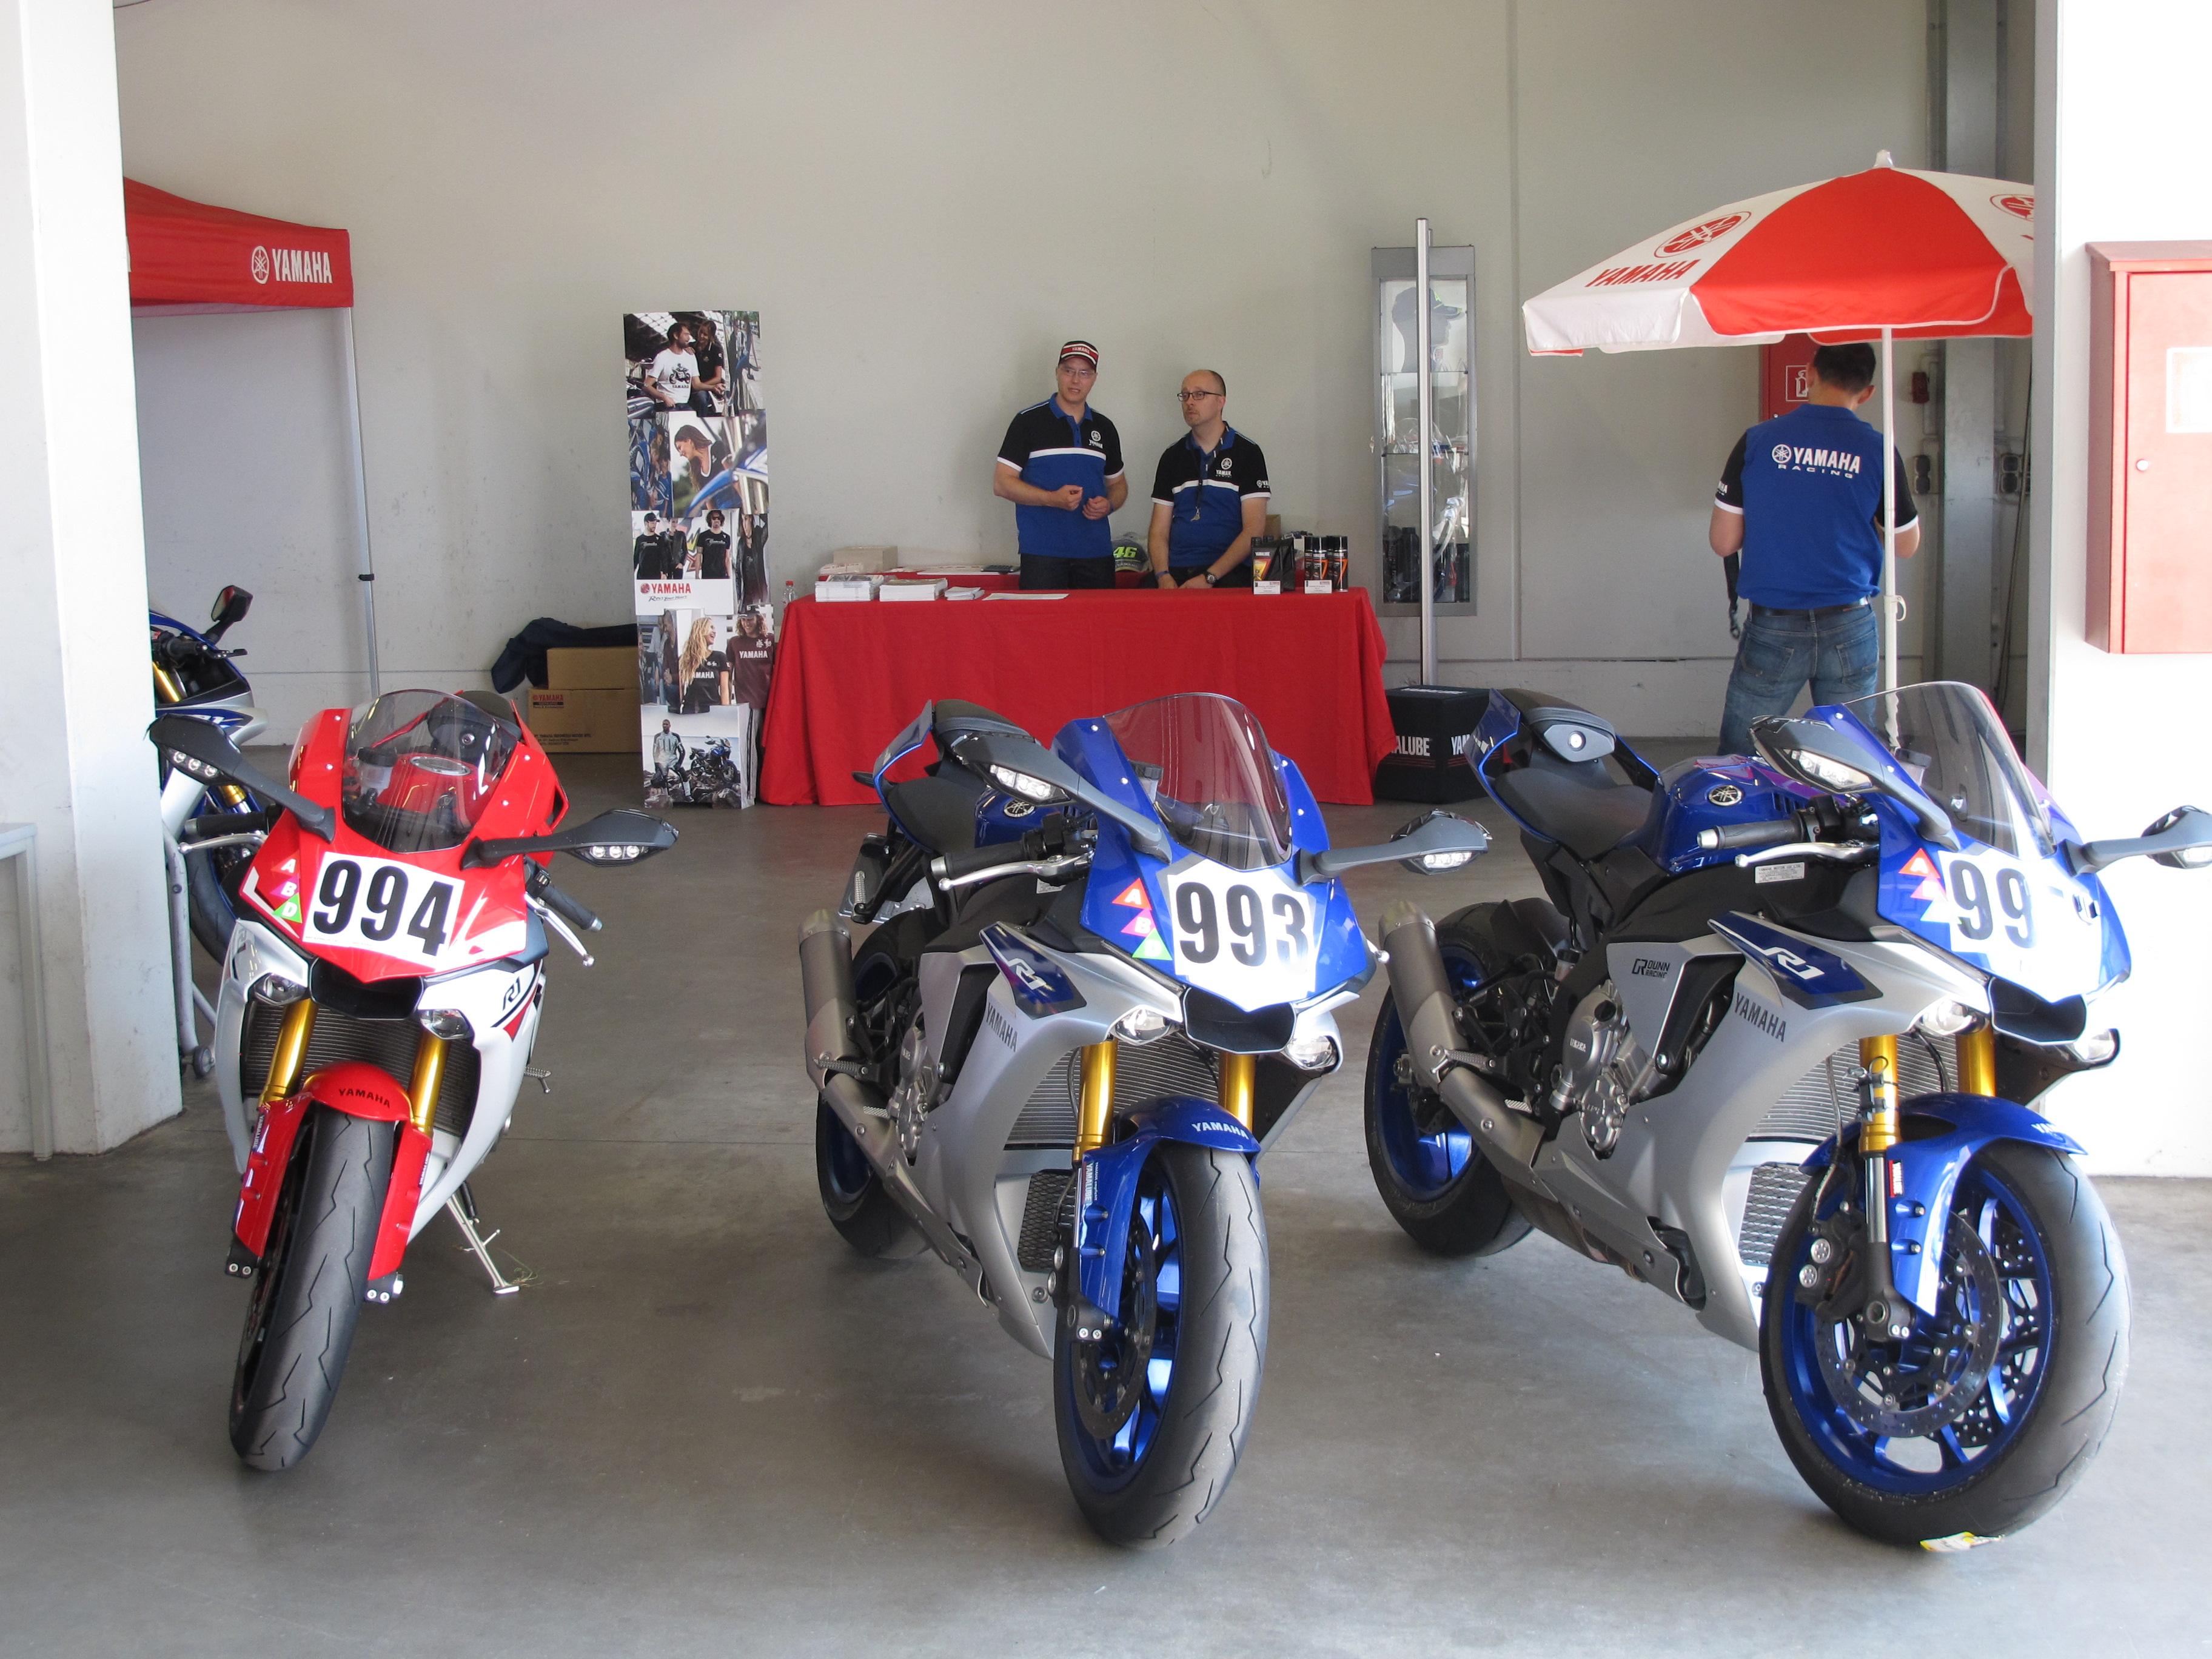 Yamaha Track Day 2015 – Nürburgring GP Strecke – Die neue Yamaha R1 ...